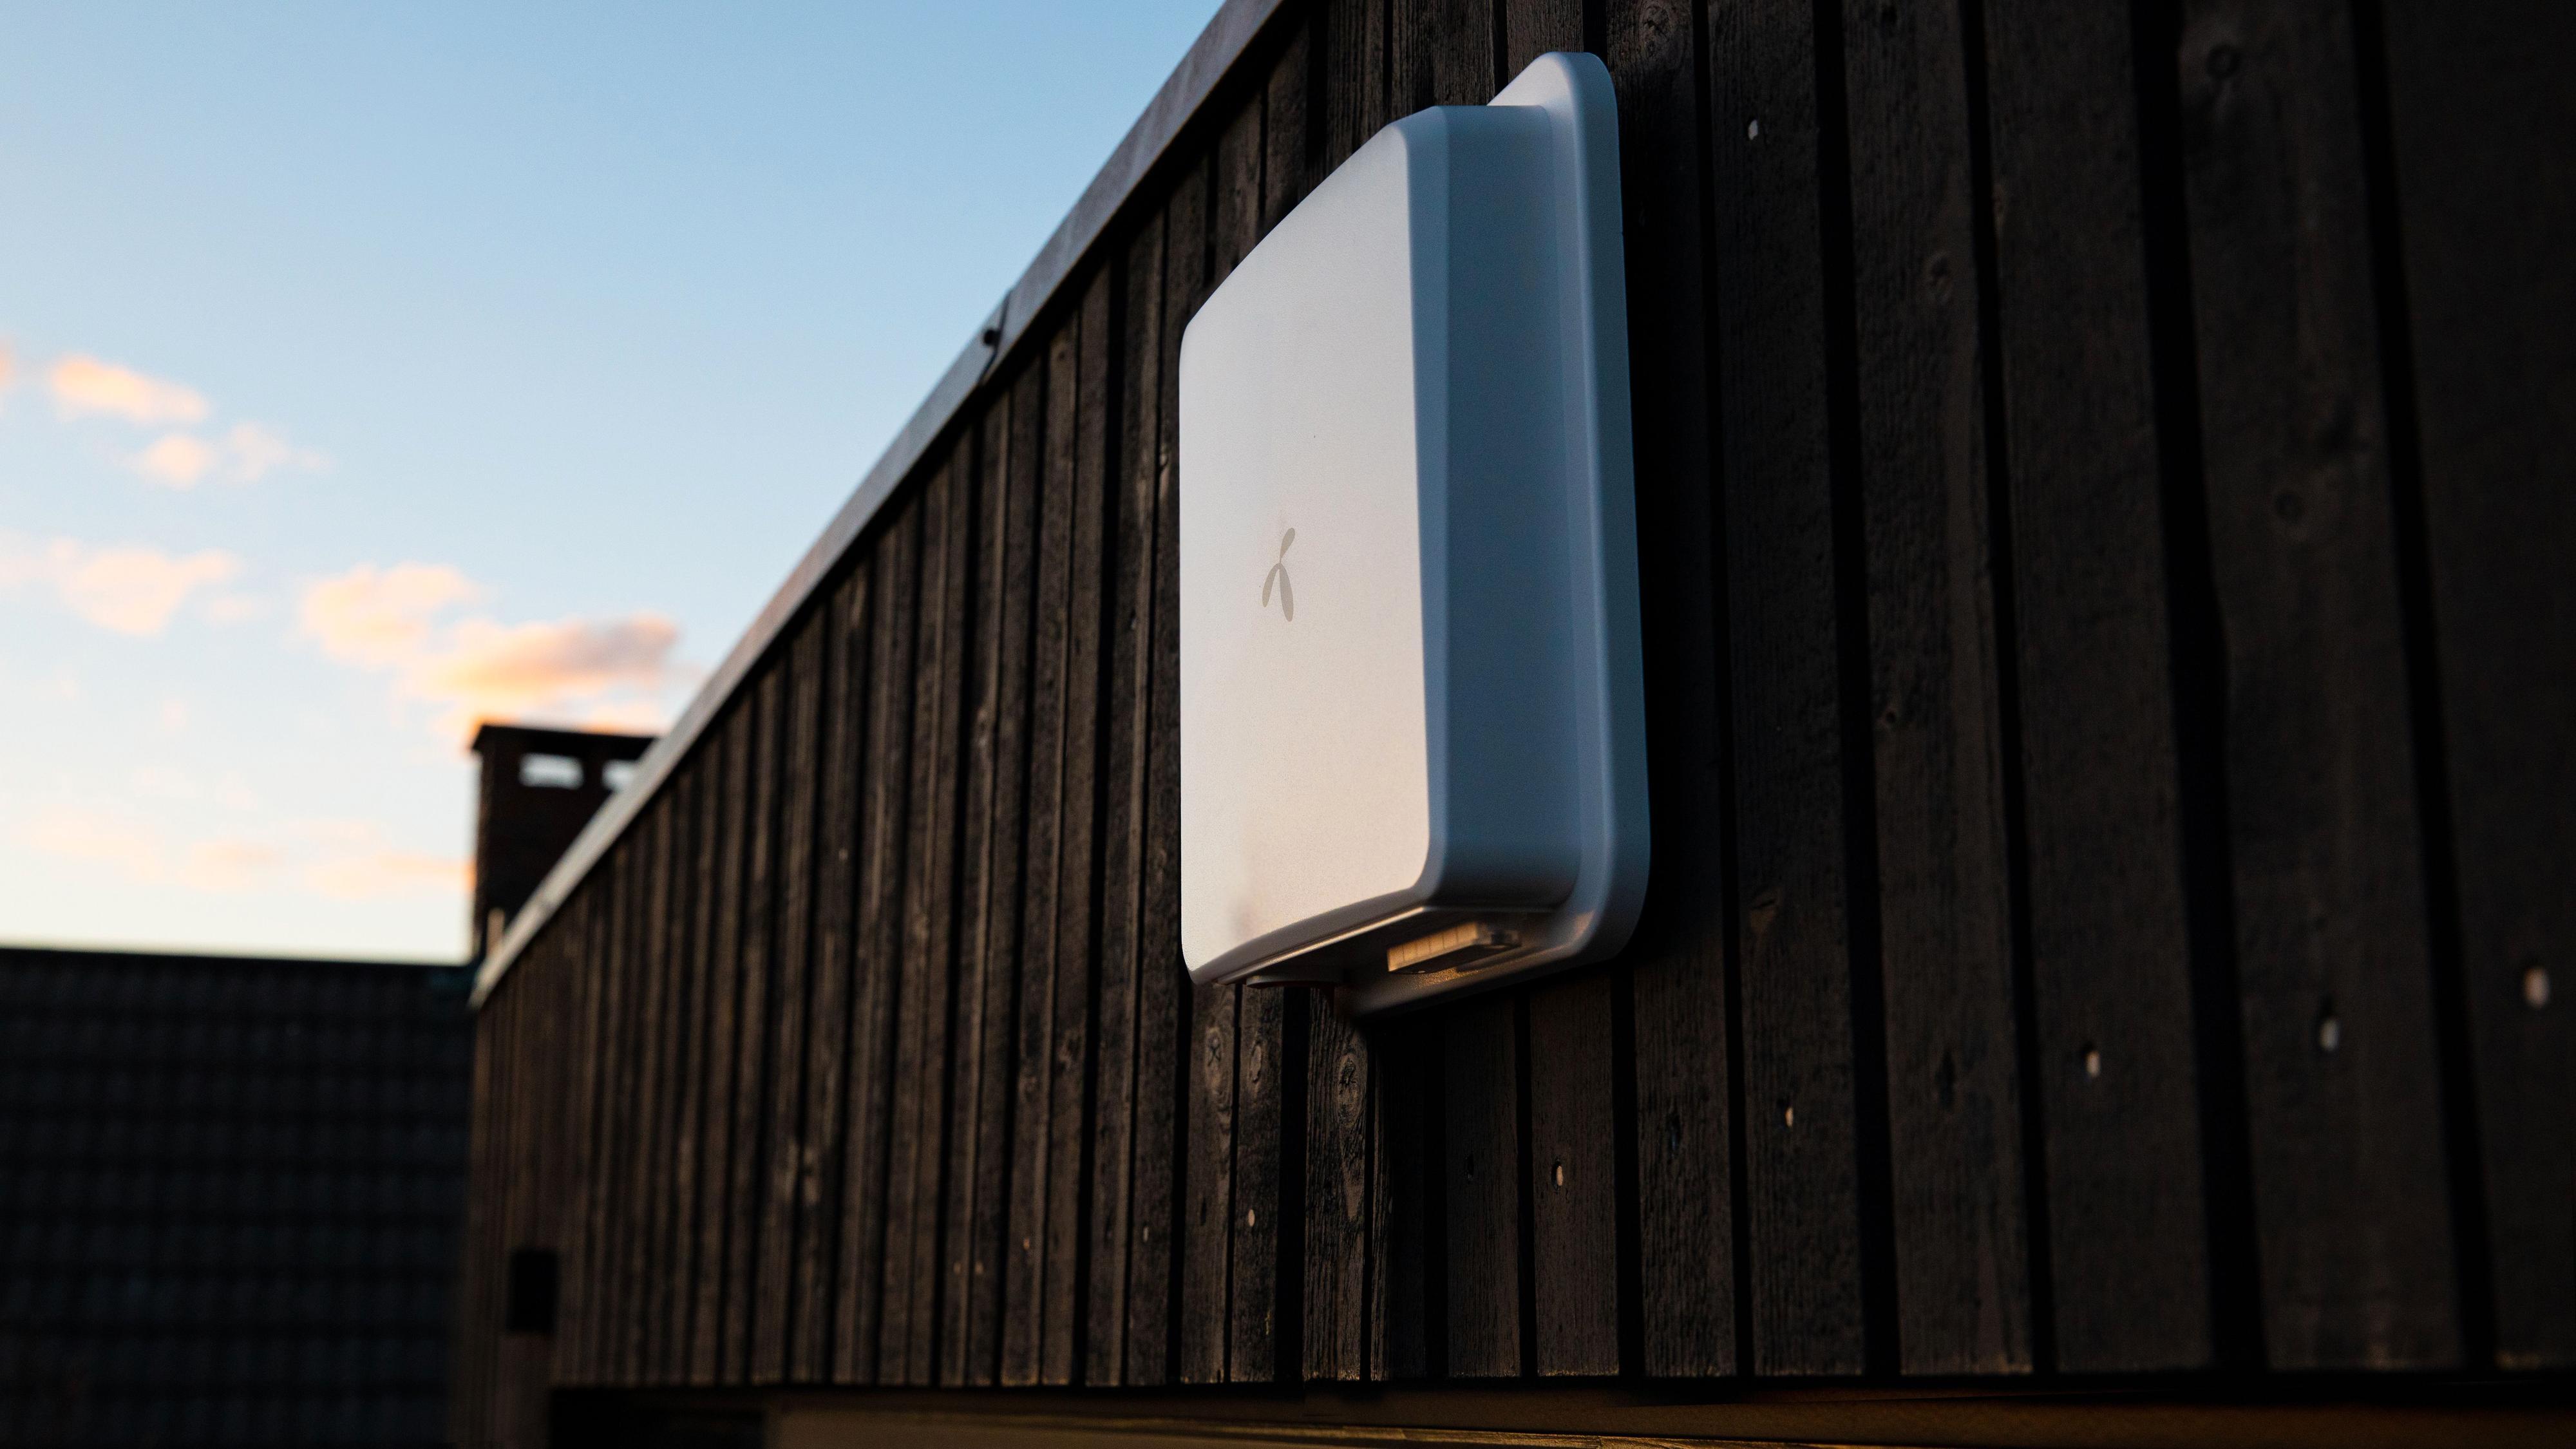 Telenor øker hastigheten på trådløst bredbånd